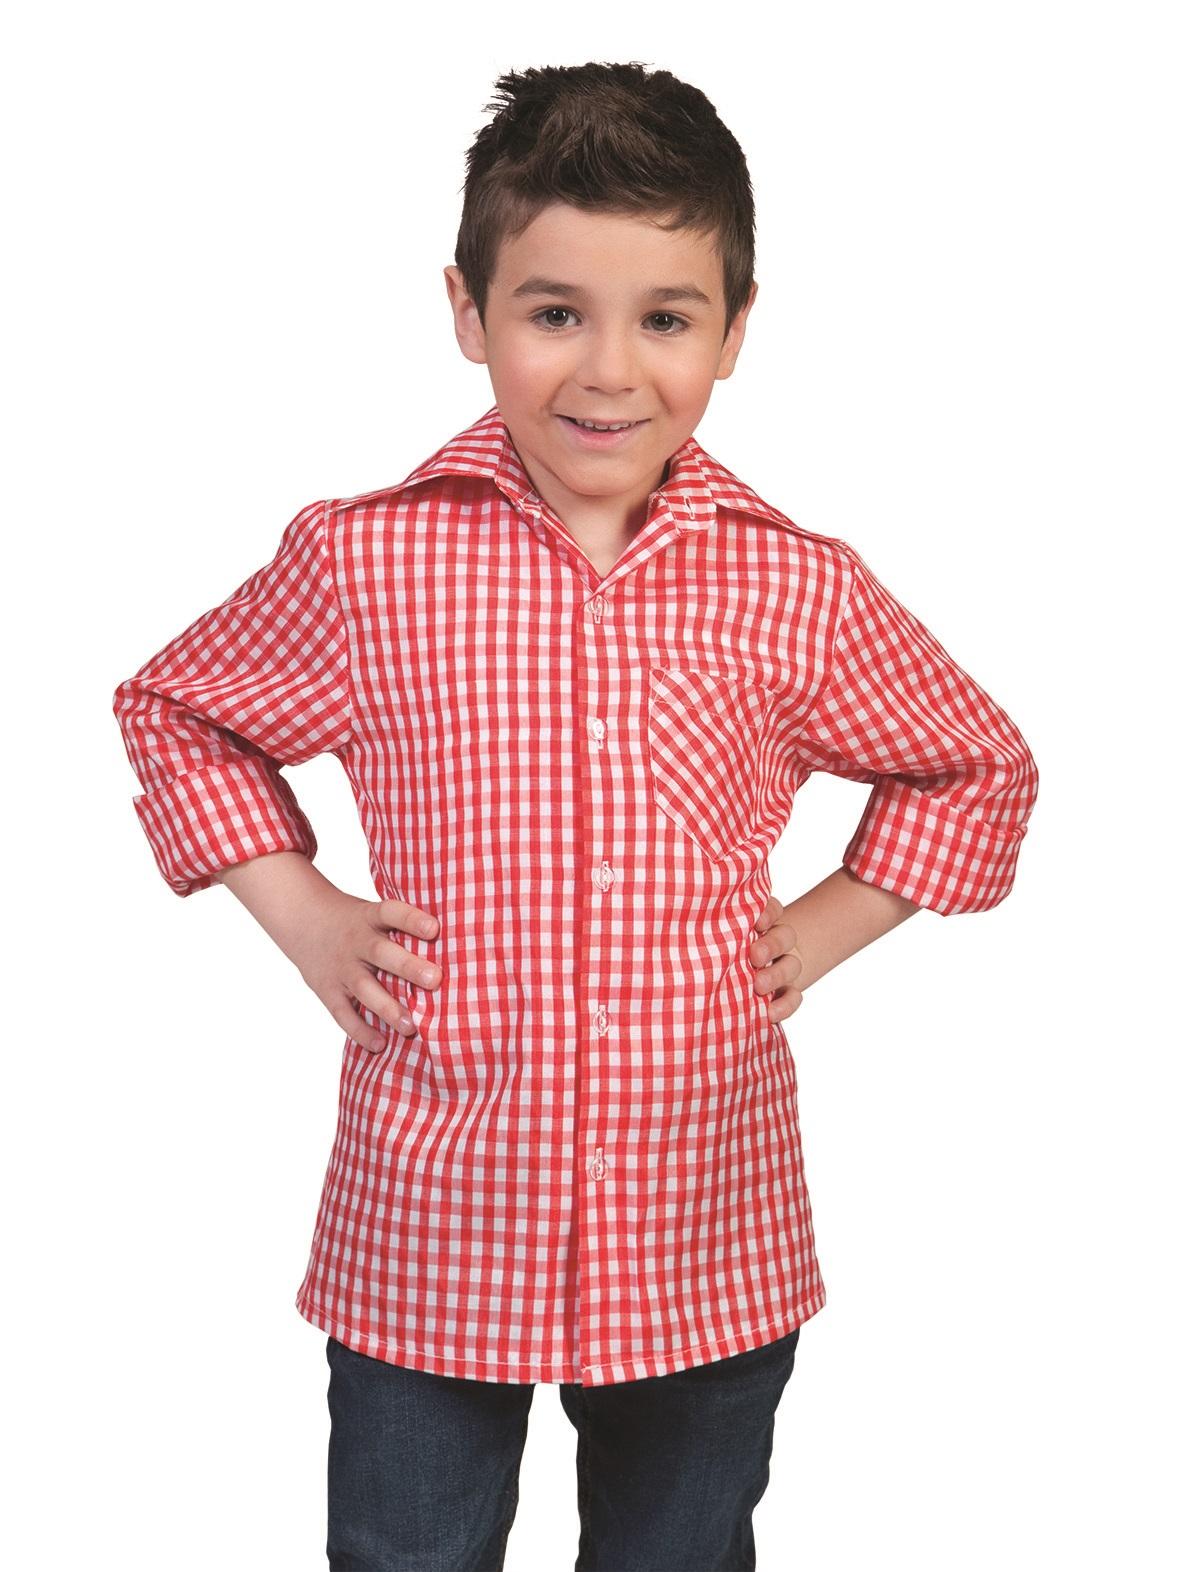 Tirolerhemd Kind rot-weiß